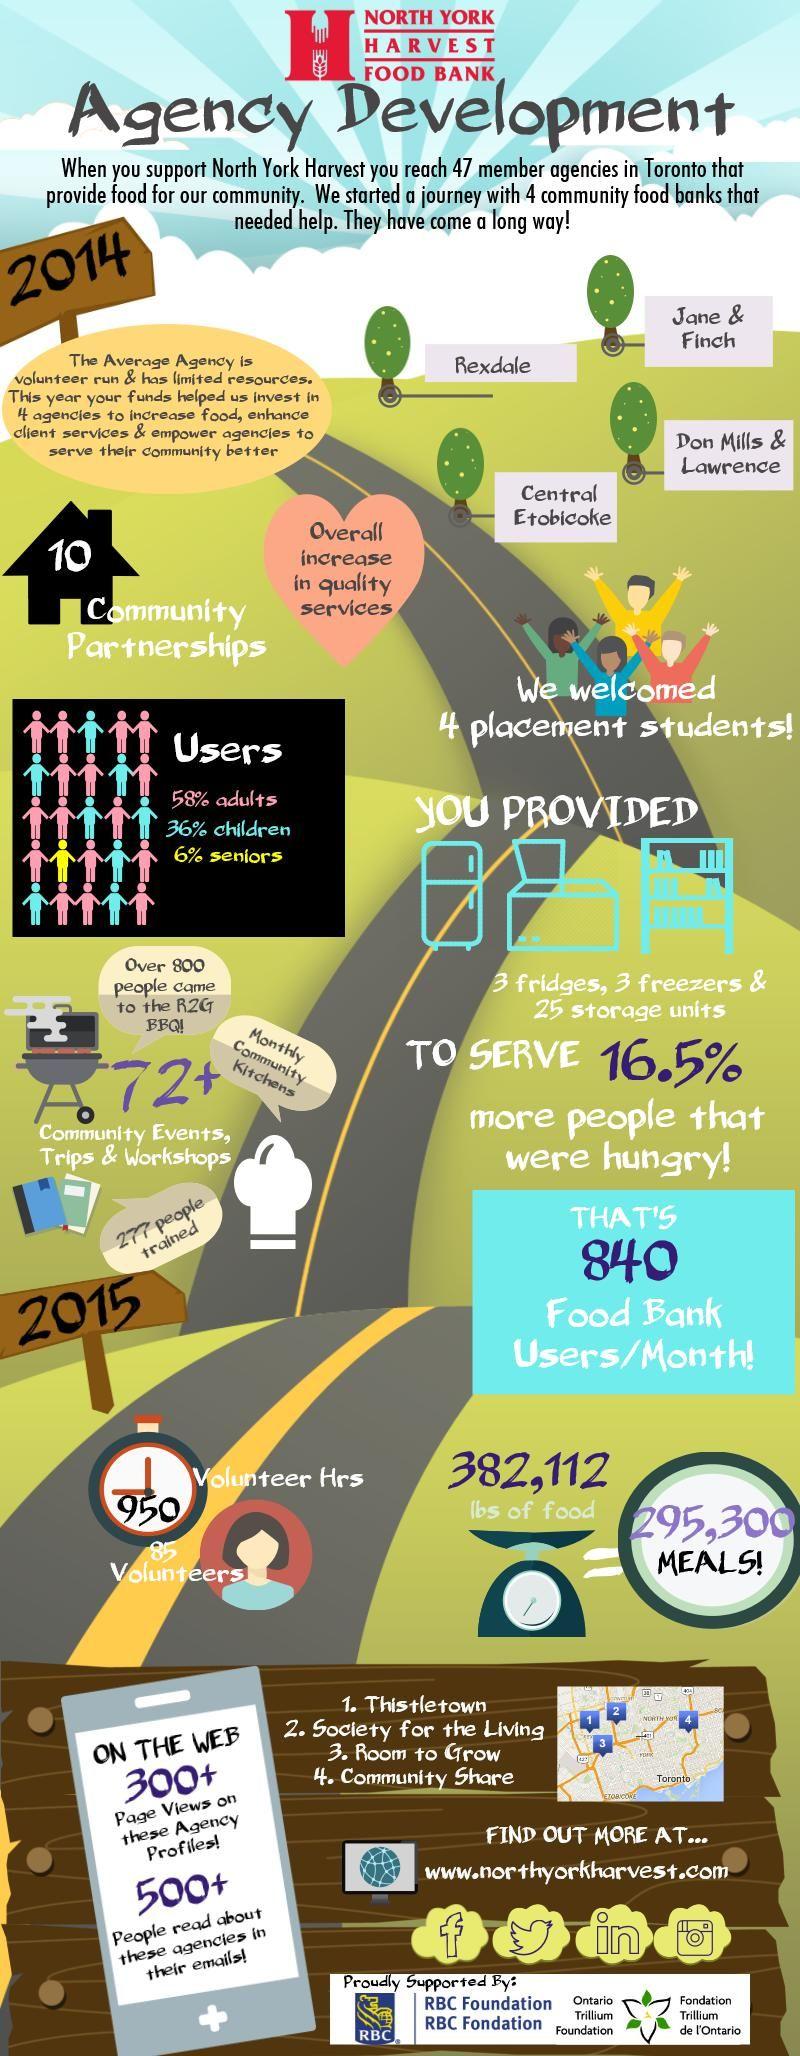 Agency Development North York Food Bank Infographic